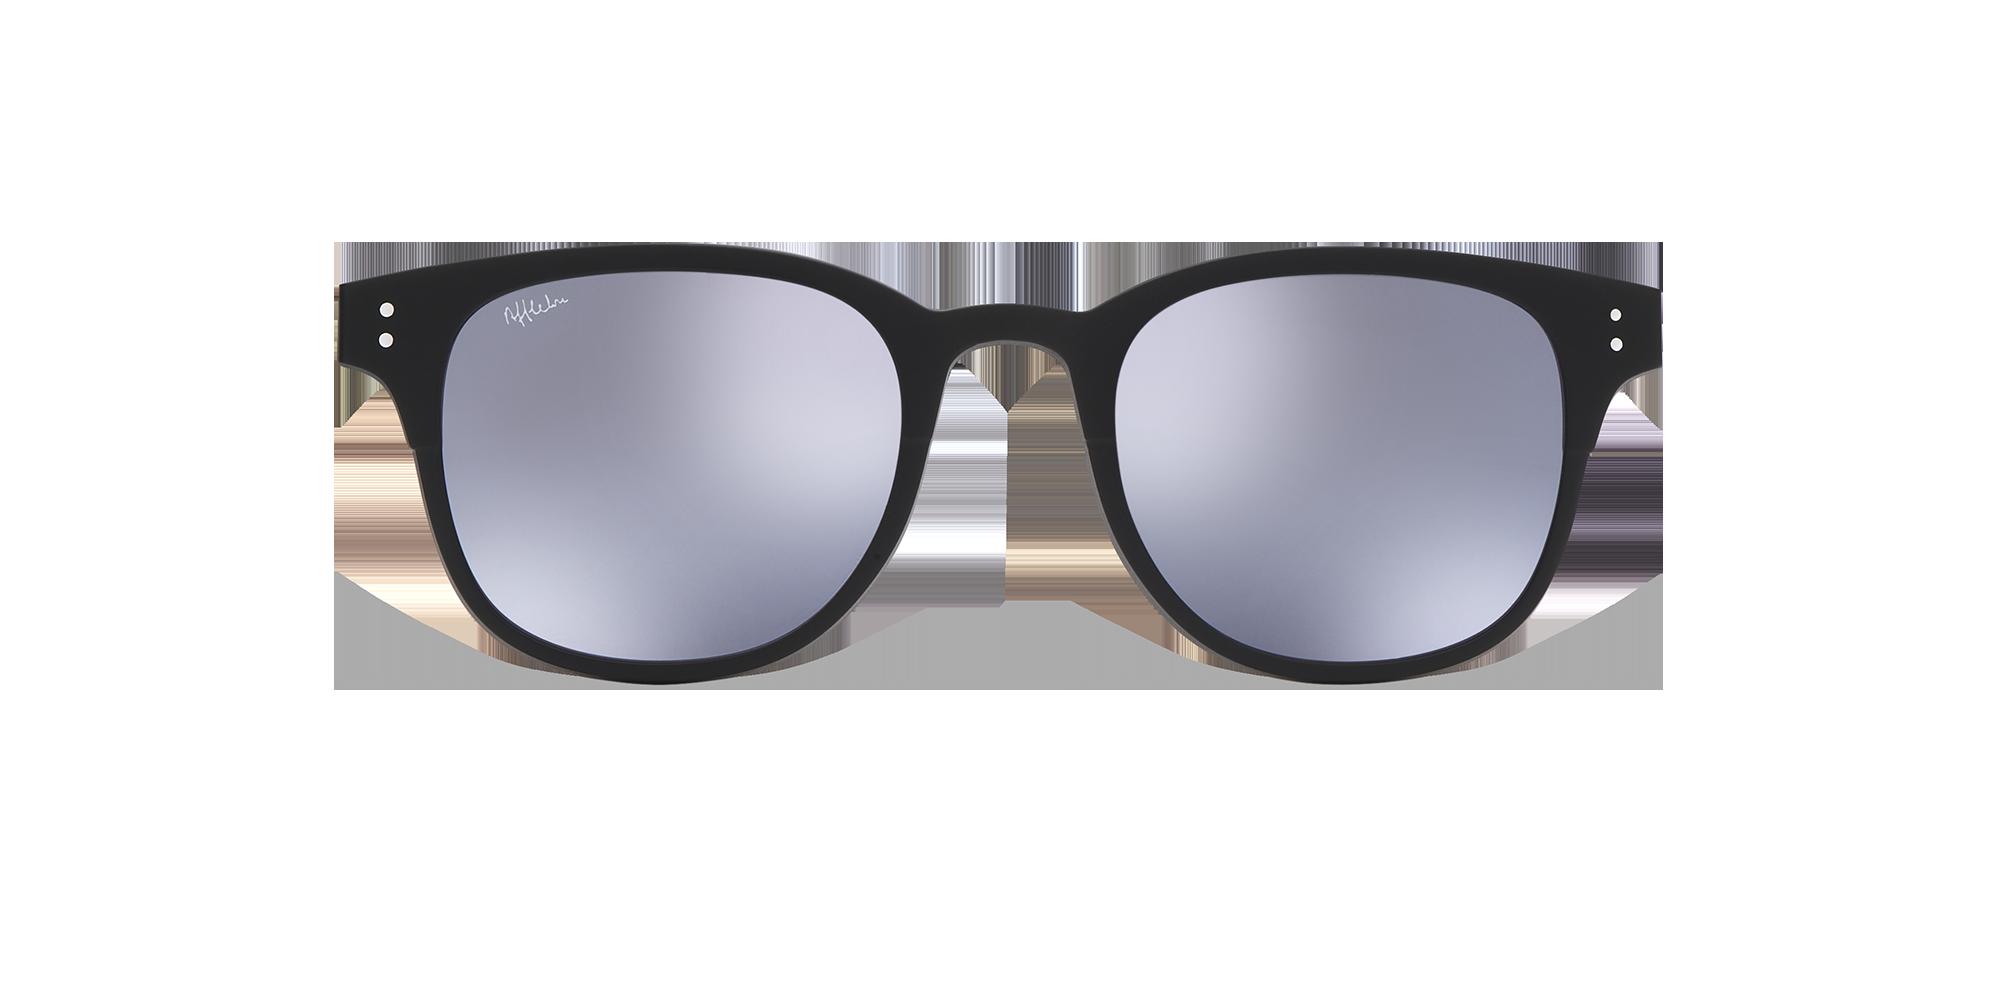 afflelou/france/products/smart_clip/clips_glasses/TMK34S4BK015021.png